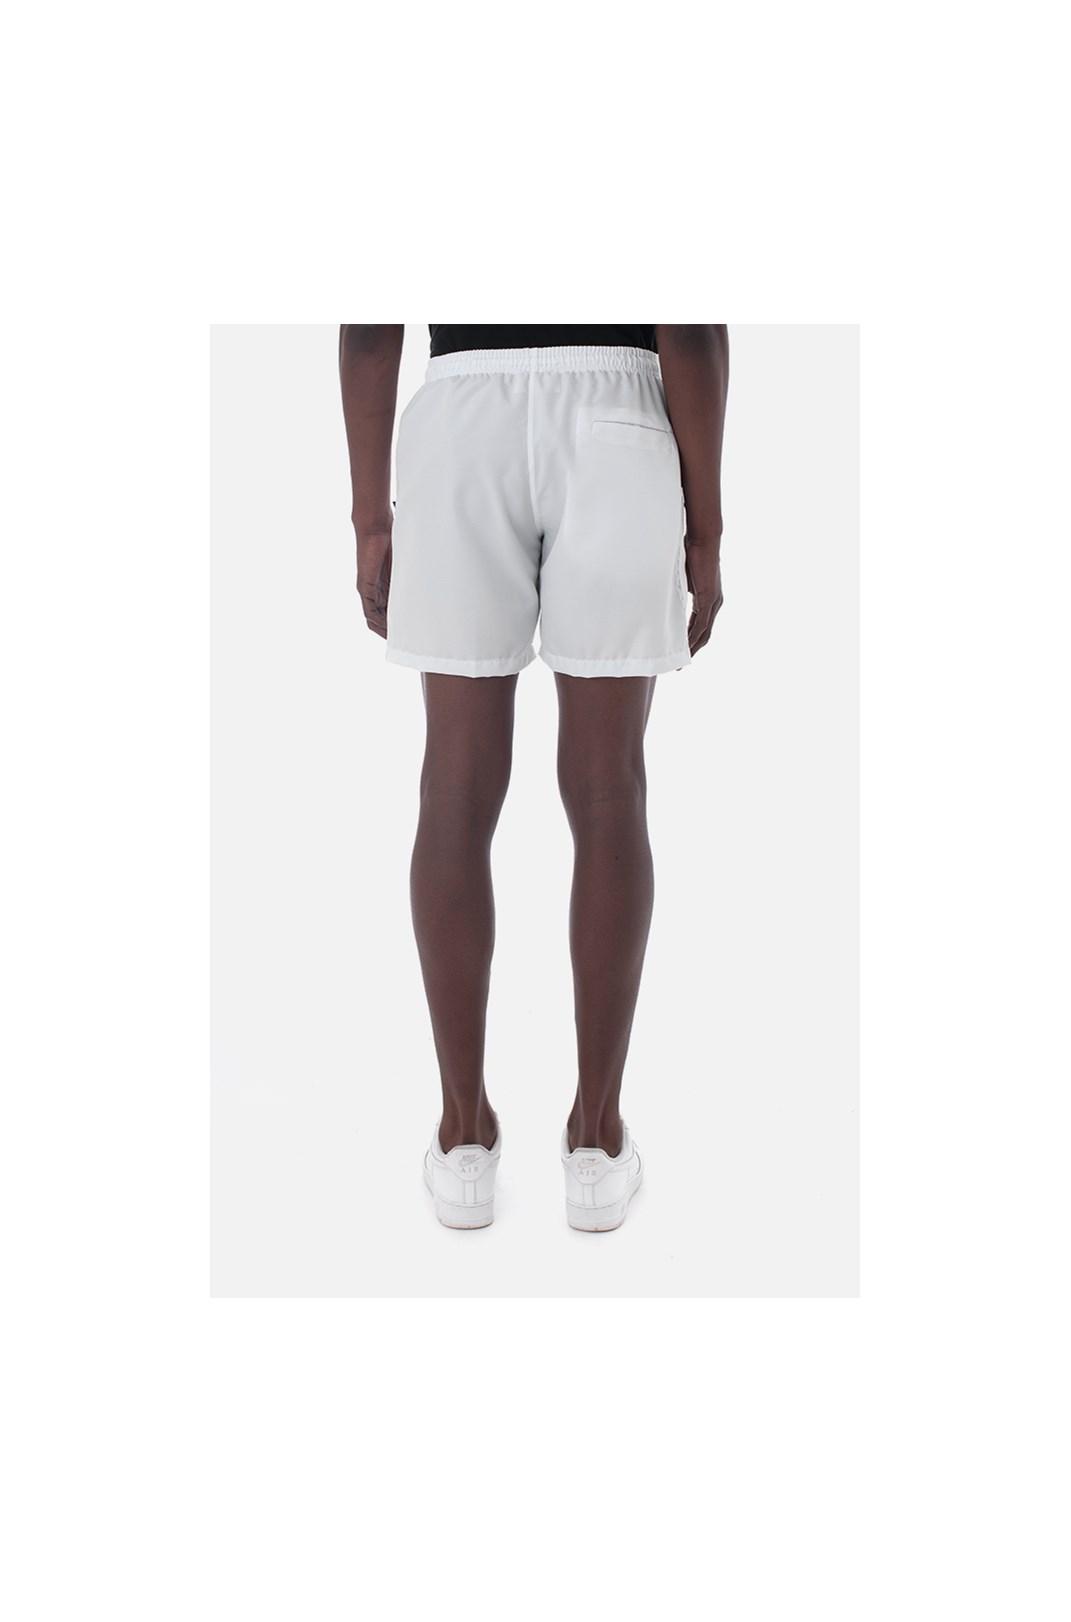 Shorts Approve Yrslf Branco